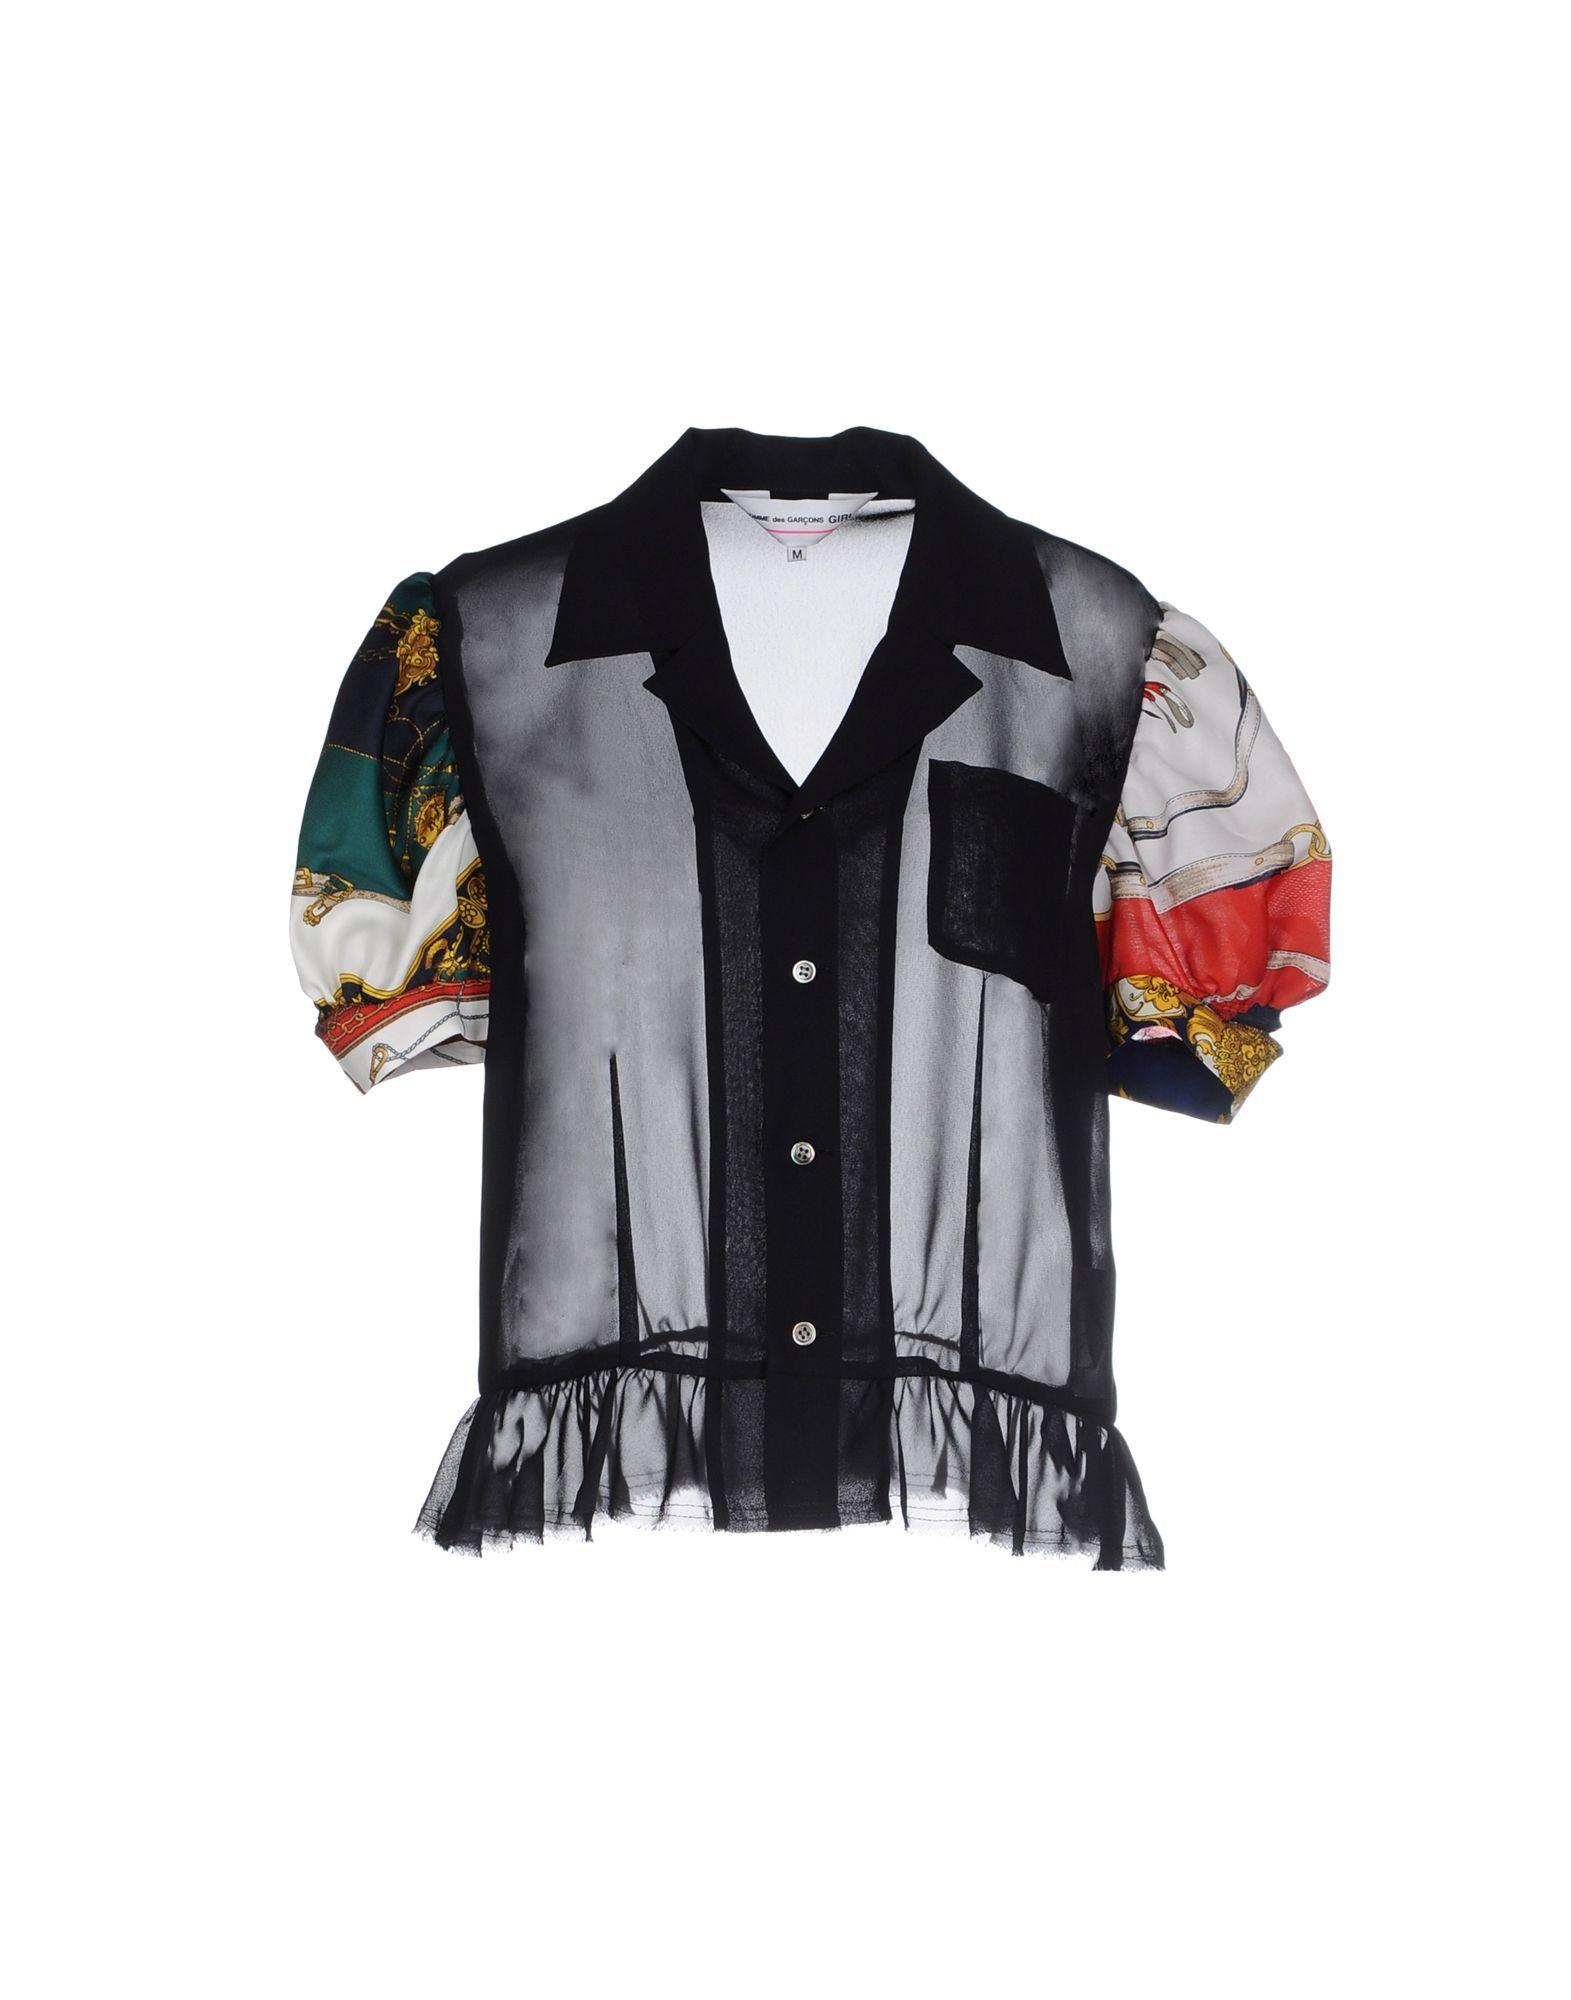 fbb212ac375 Comme Des Garçons Women Shirt on YOOX.COM. The best online selection of  Shirts Comme Des Garçons. YOOX.COM exclusive items of Italian and  international ...